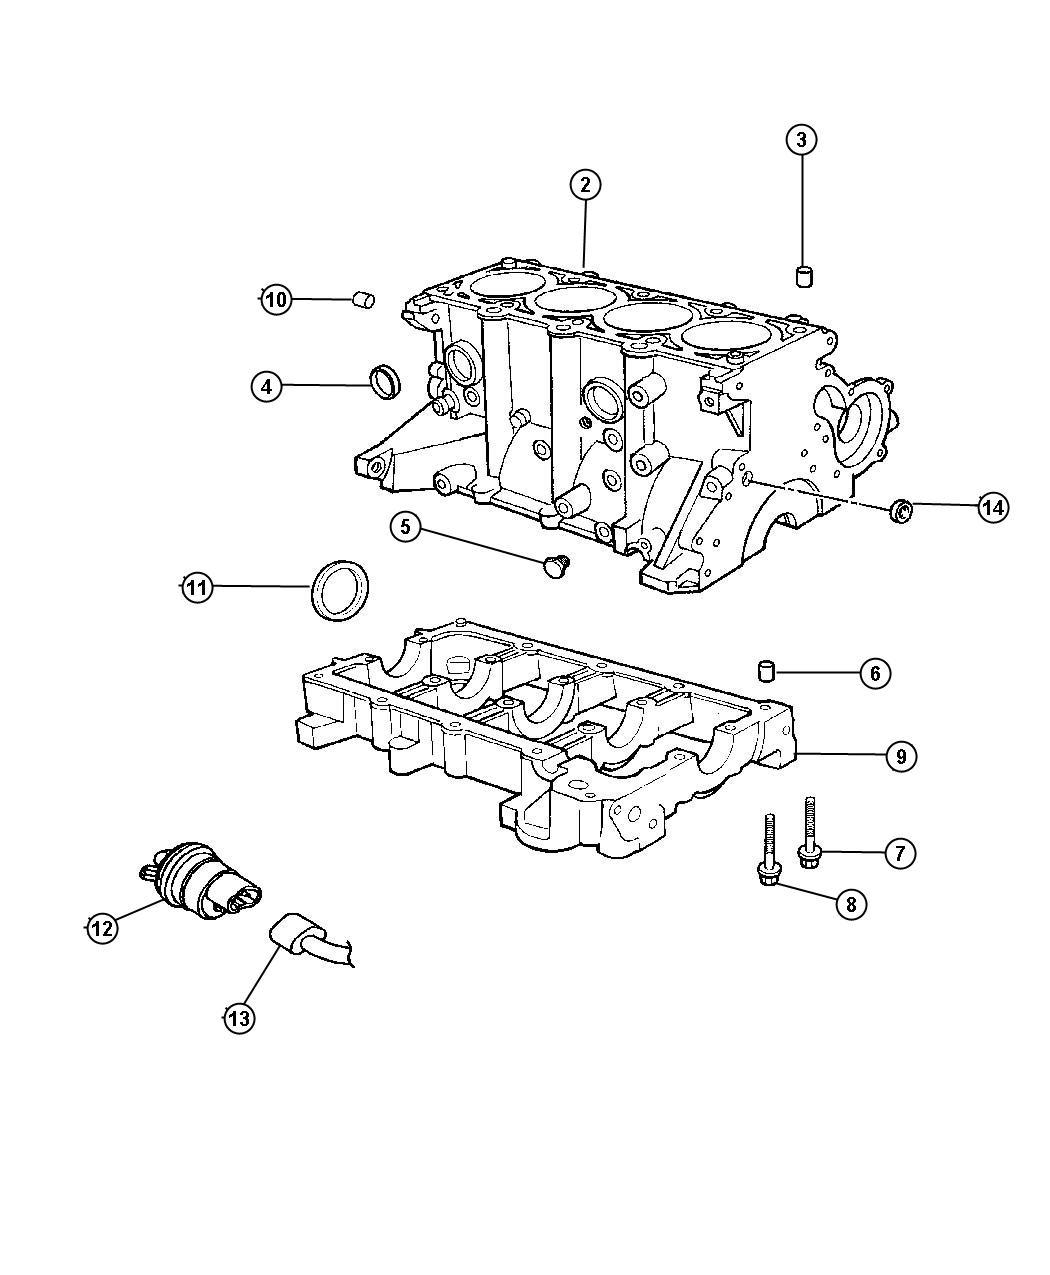 Chrysler Sebring Heater Engine Block 2 4l Engine